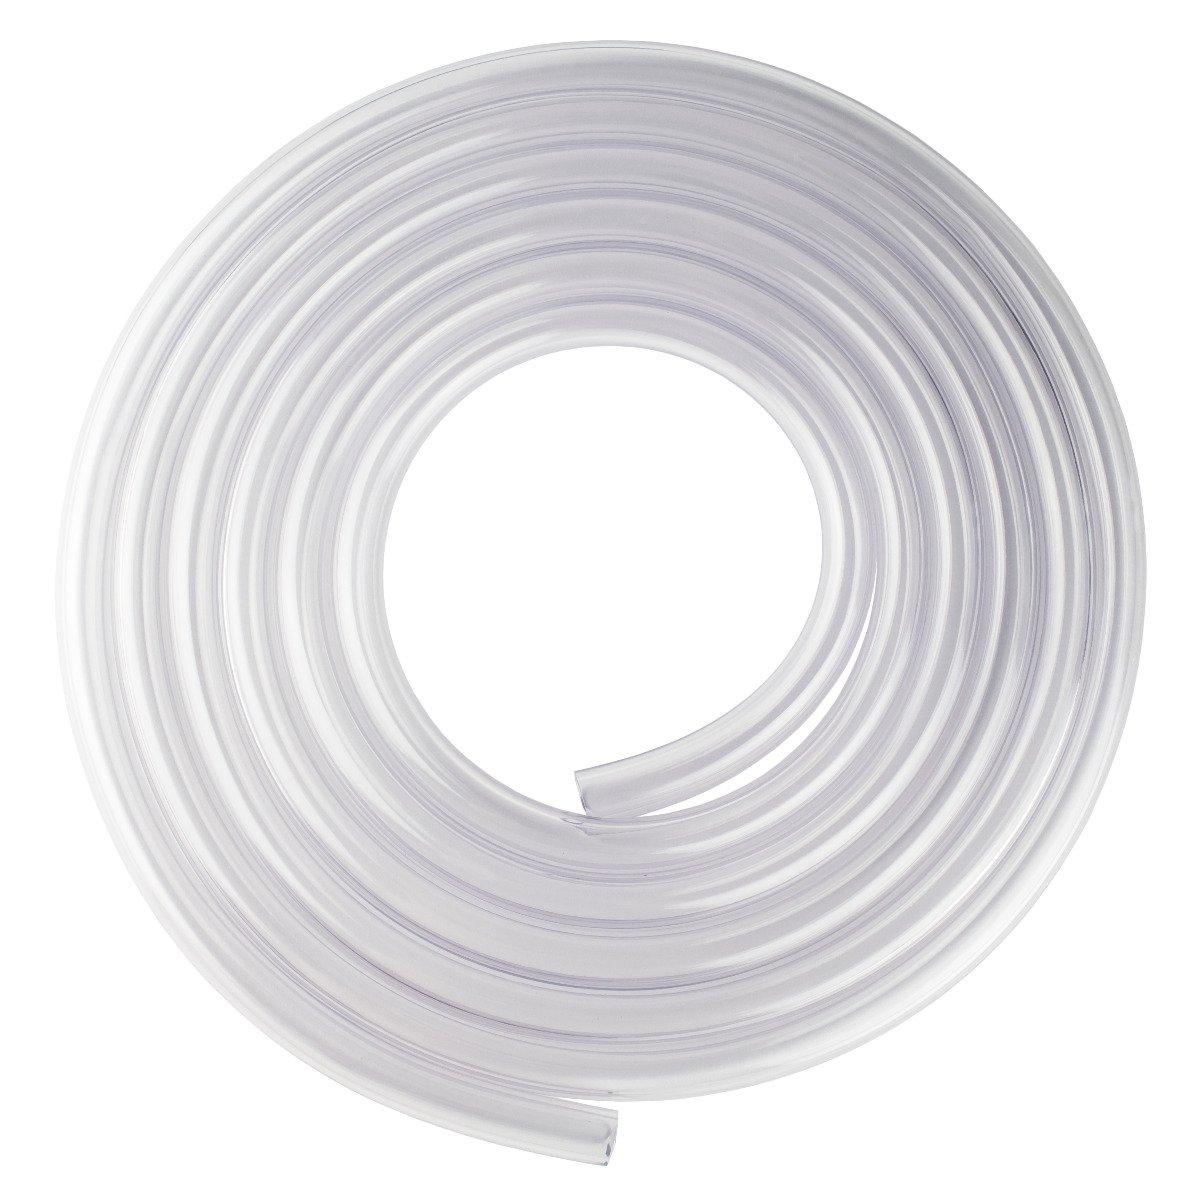 Mayhems Ultra Clear Tubing 1/2' ID 3/4' OD 13/19mm 5m Mayhems Solutions LTD 4328428199